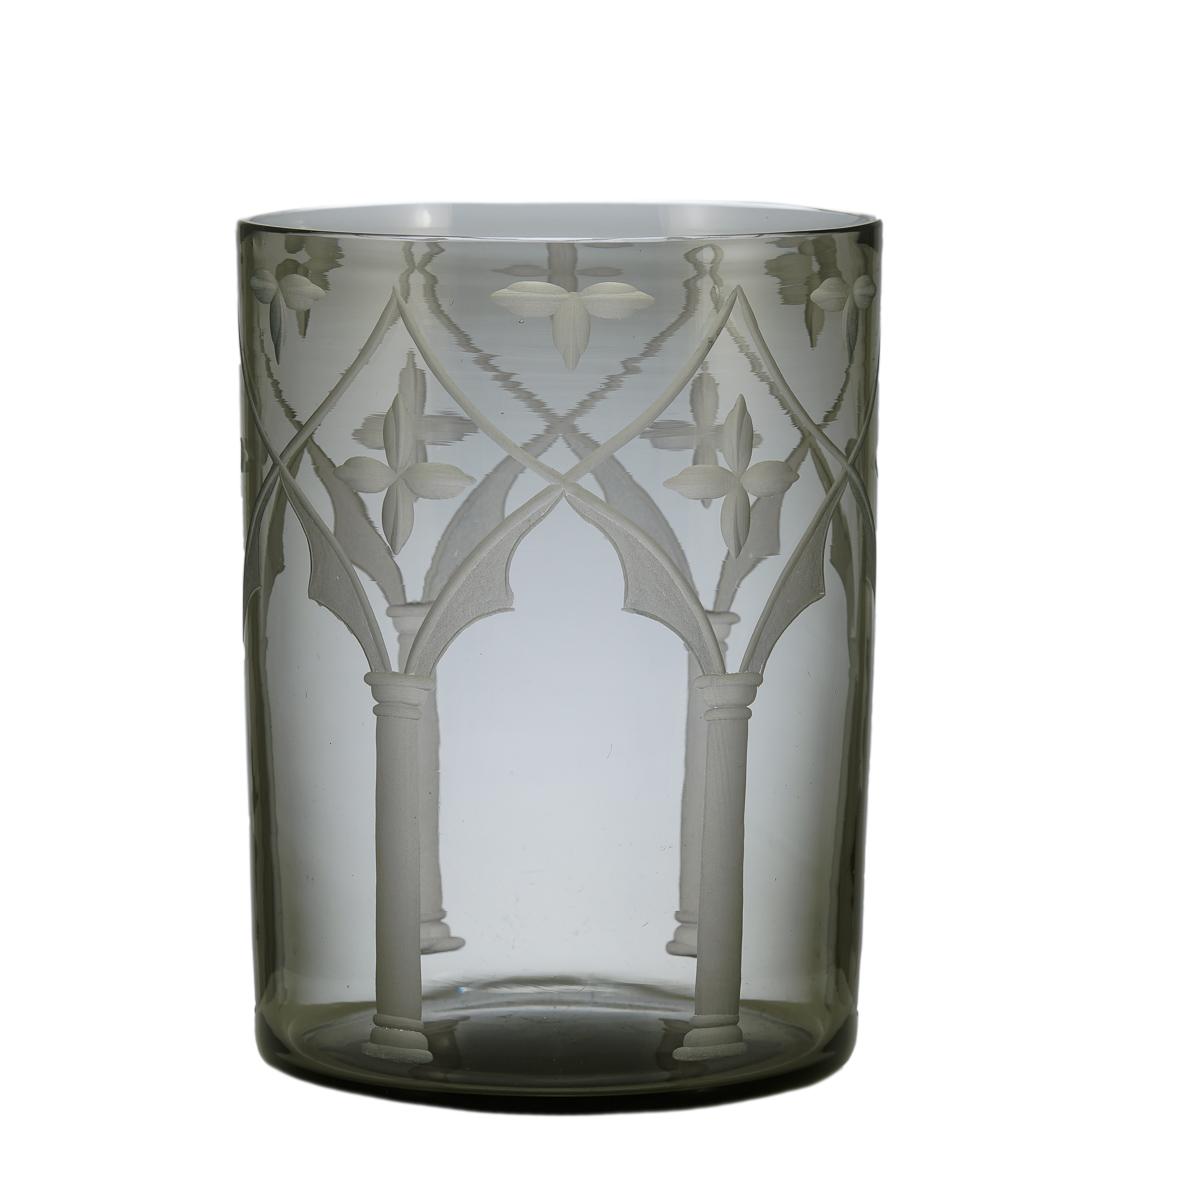 palazzo-ca-doro-vase-candle-crystal-grey-murano-giberto-design-precious-luxury-handmade-flower